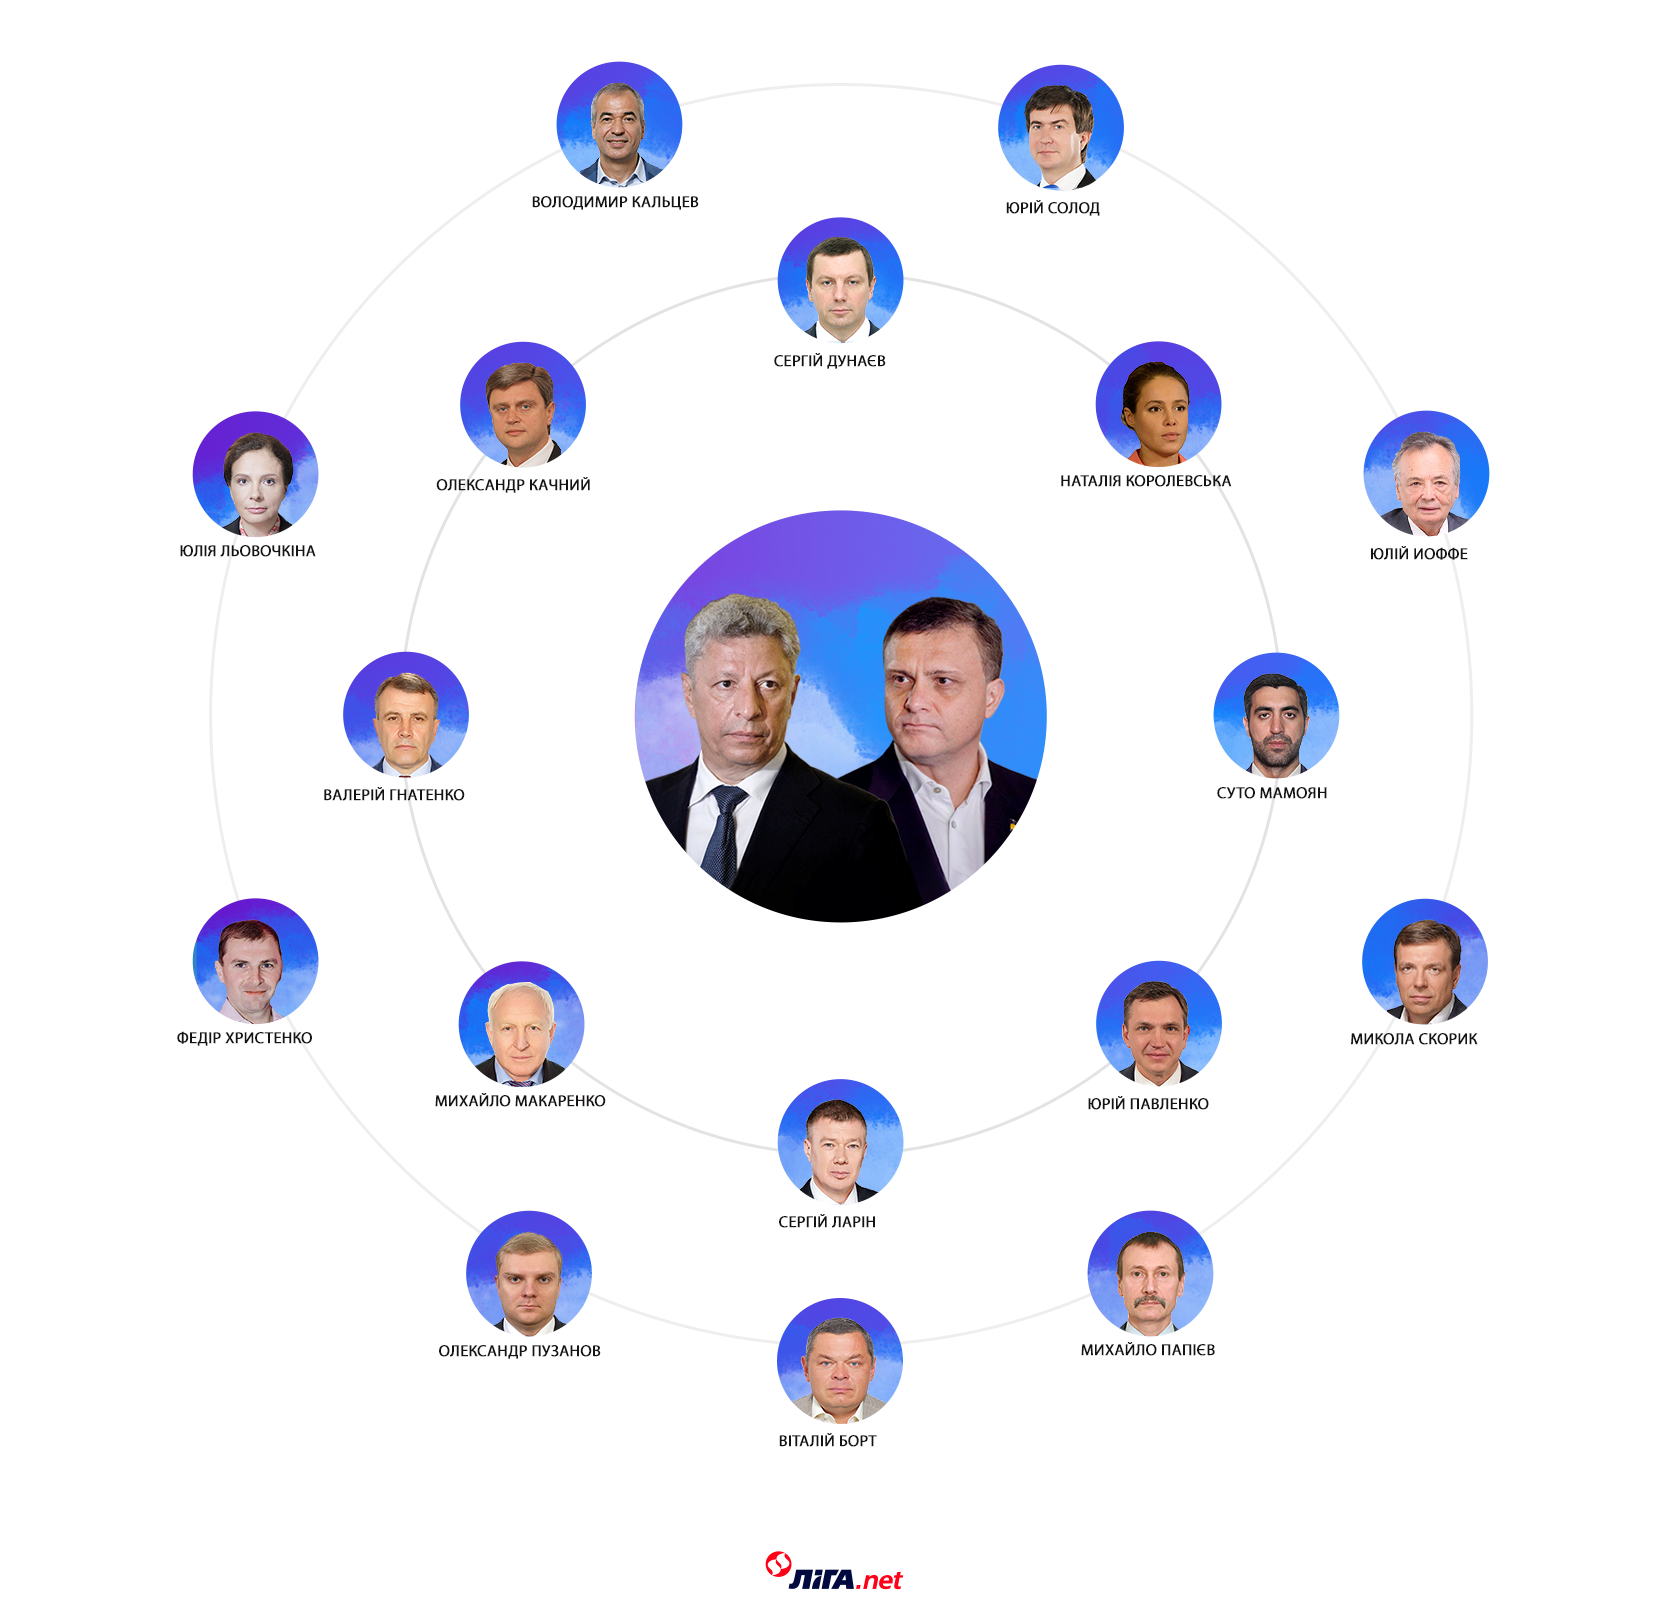 Група Бойка-Льовочкіна (інфографіка – LIGА.net)